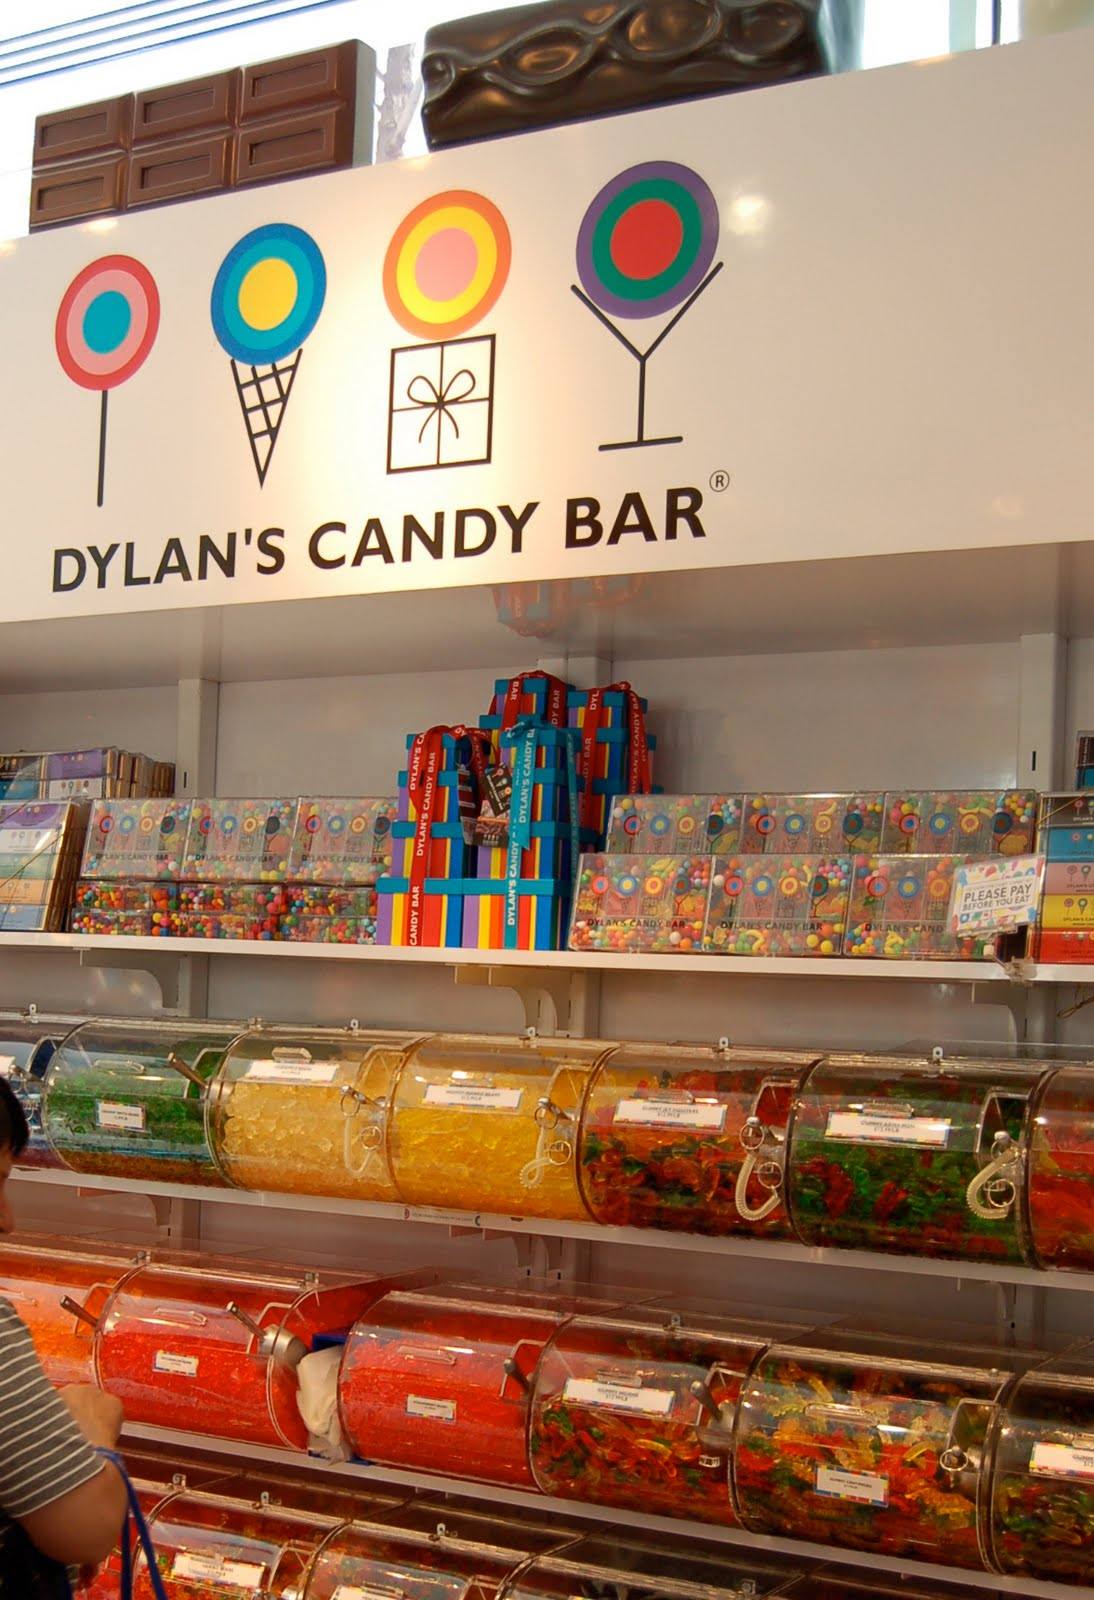 Hamptons Shopping Part IV – Dylans Candy Bar | Linda ...